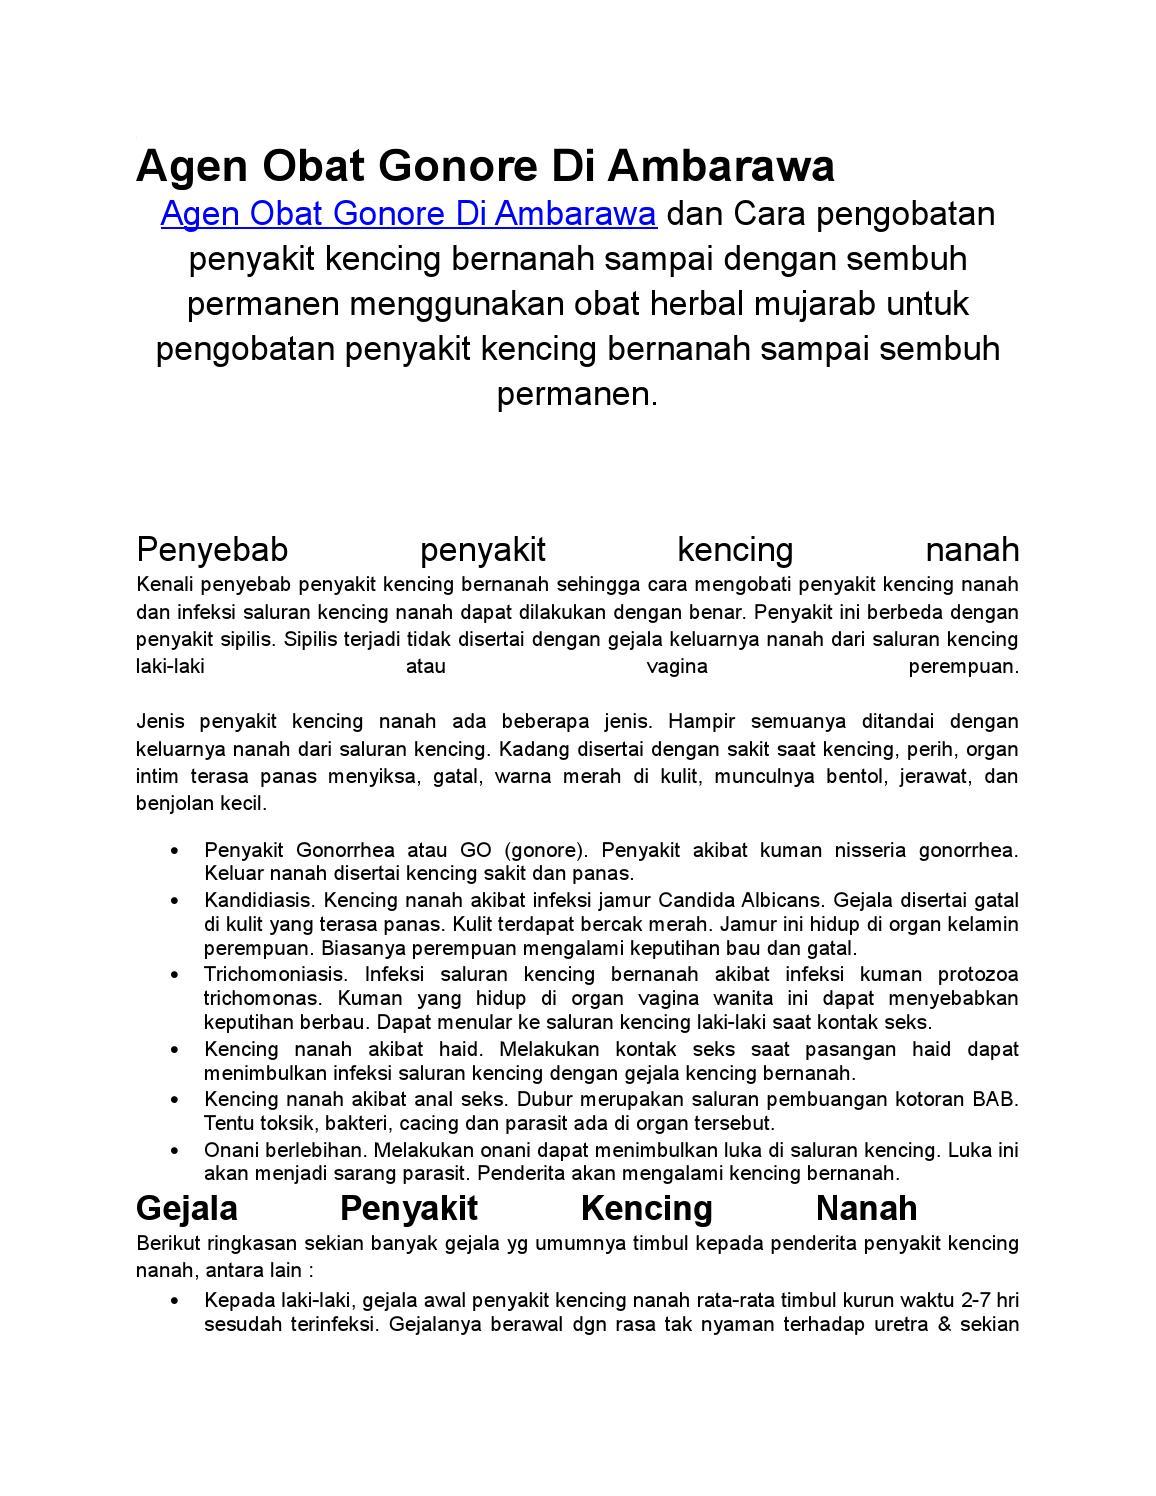 Agen Obat Gonore Di Ambarawa By Wahyu Kris Issuu Sakit Go Sipilis Raja Singa Isk